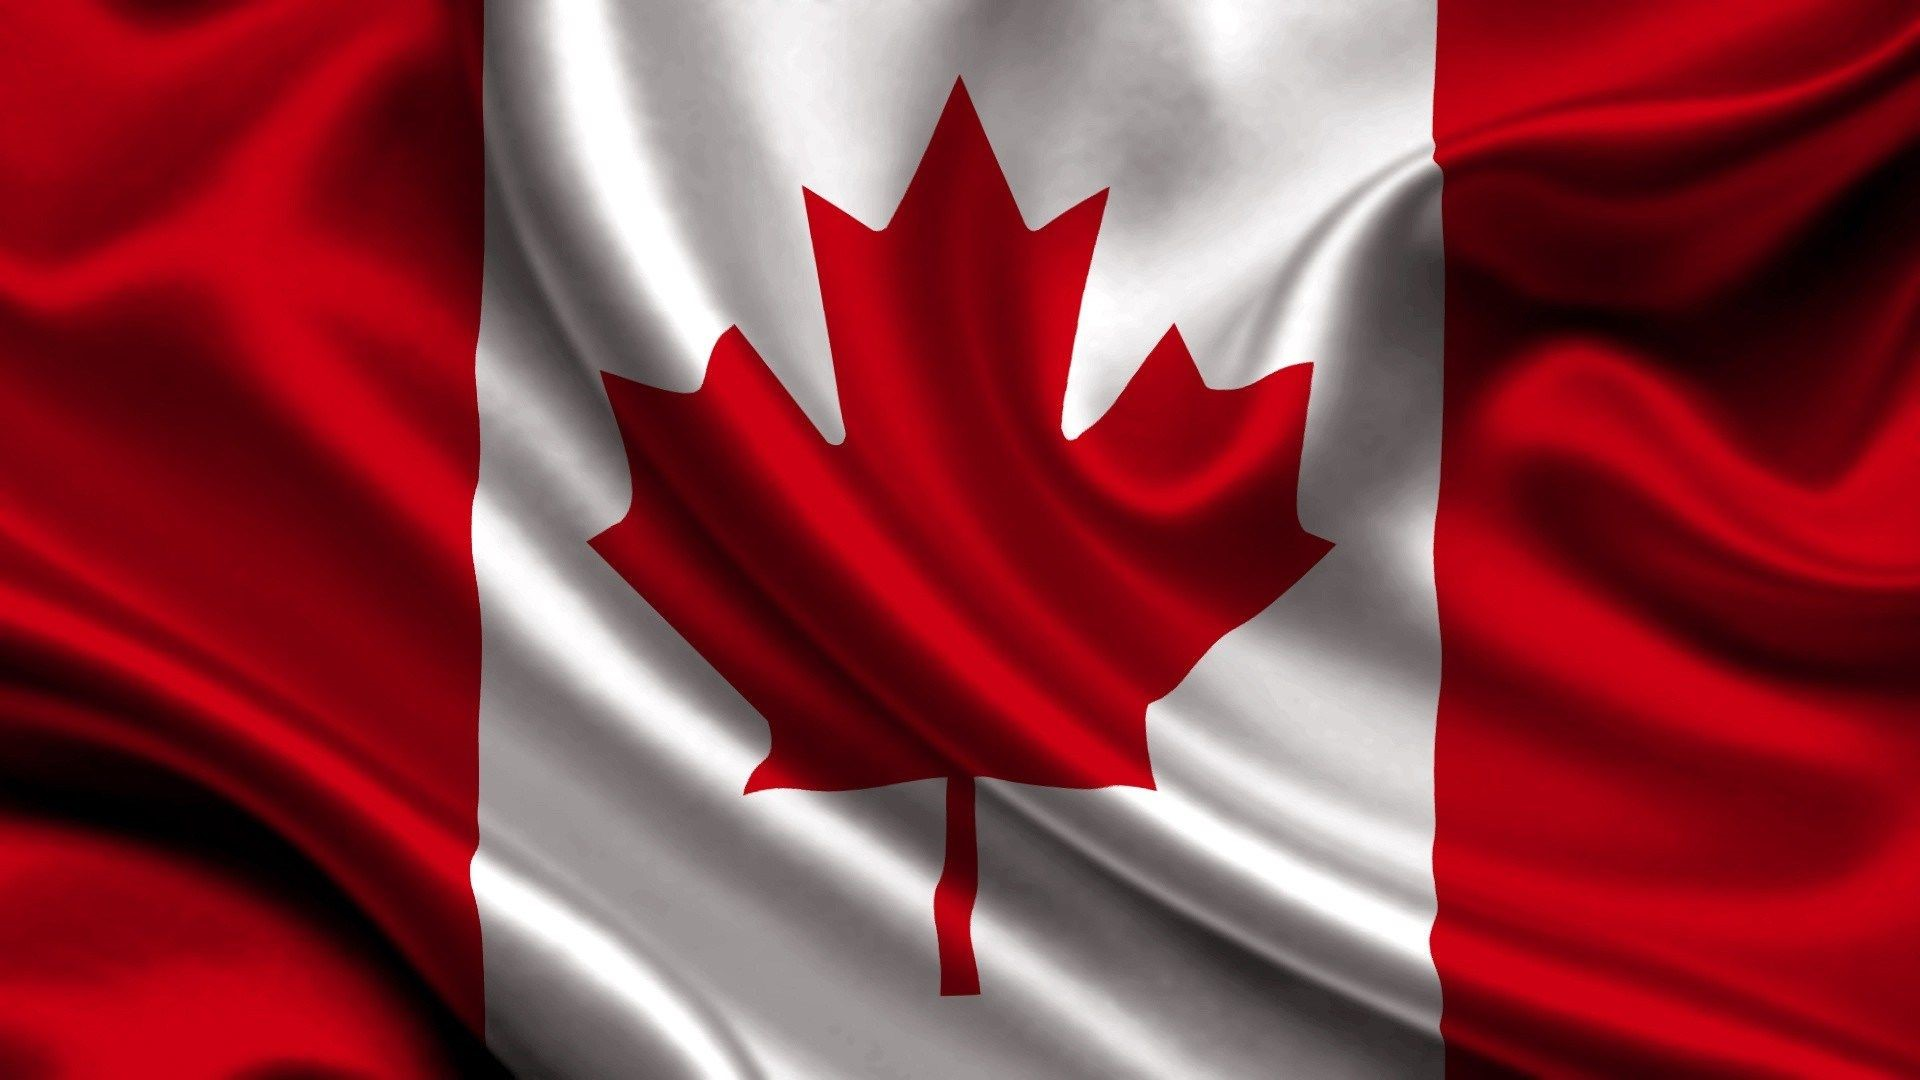 تحصیل در کانادا و پرچم کانادا